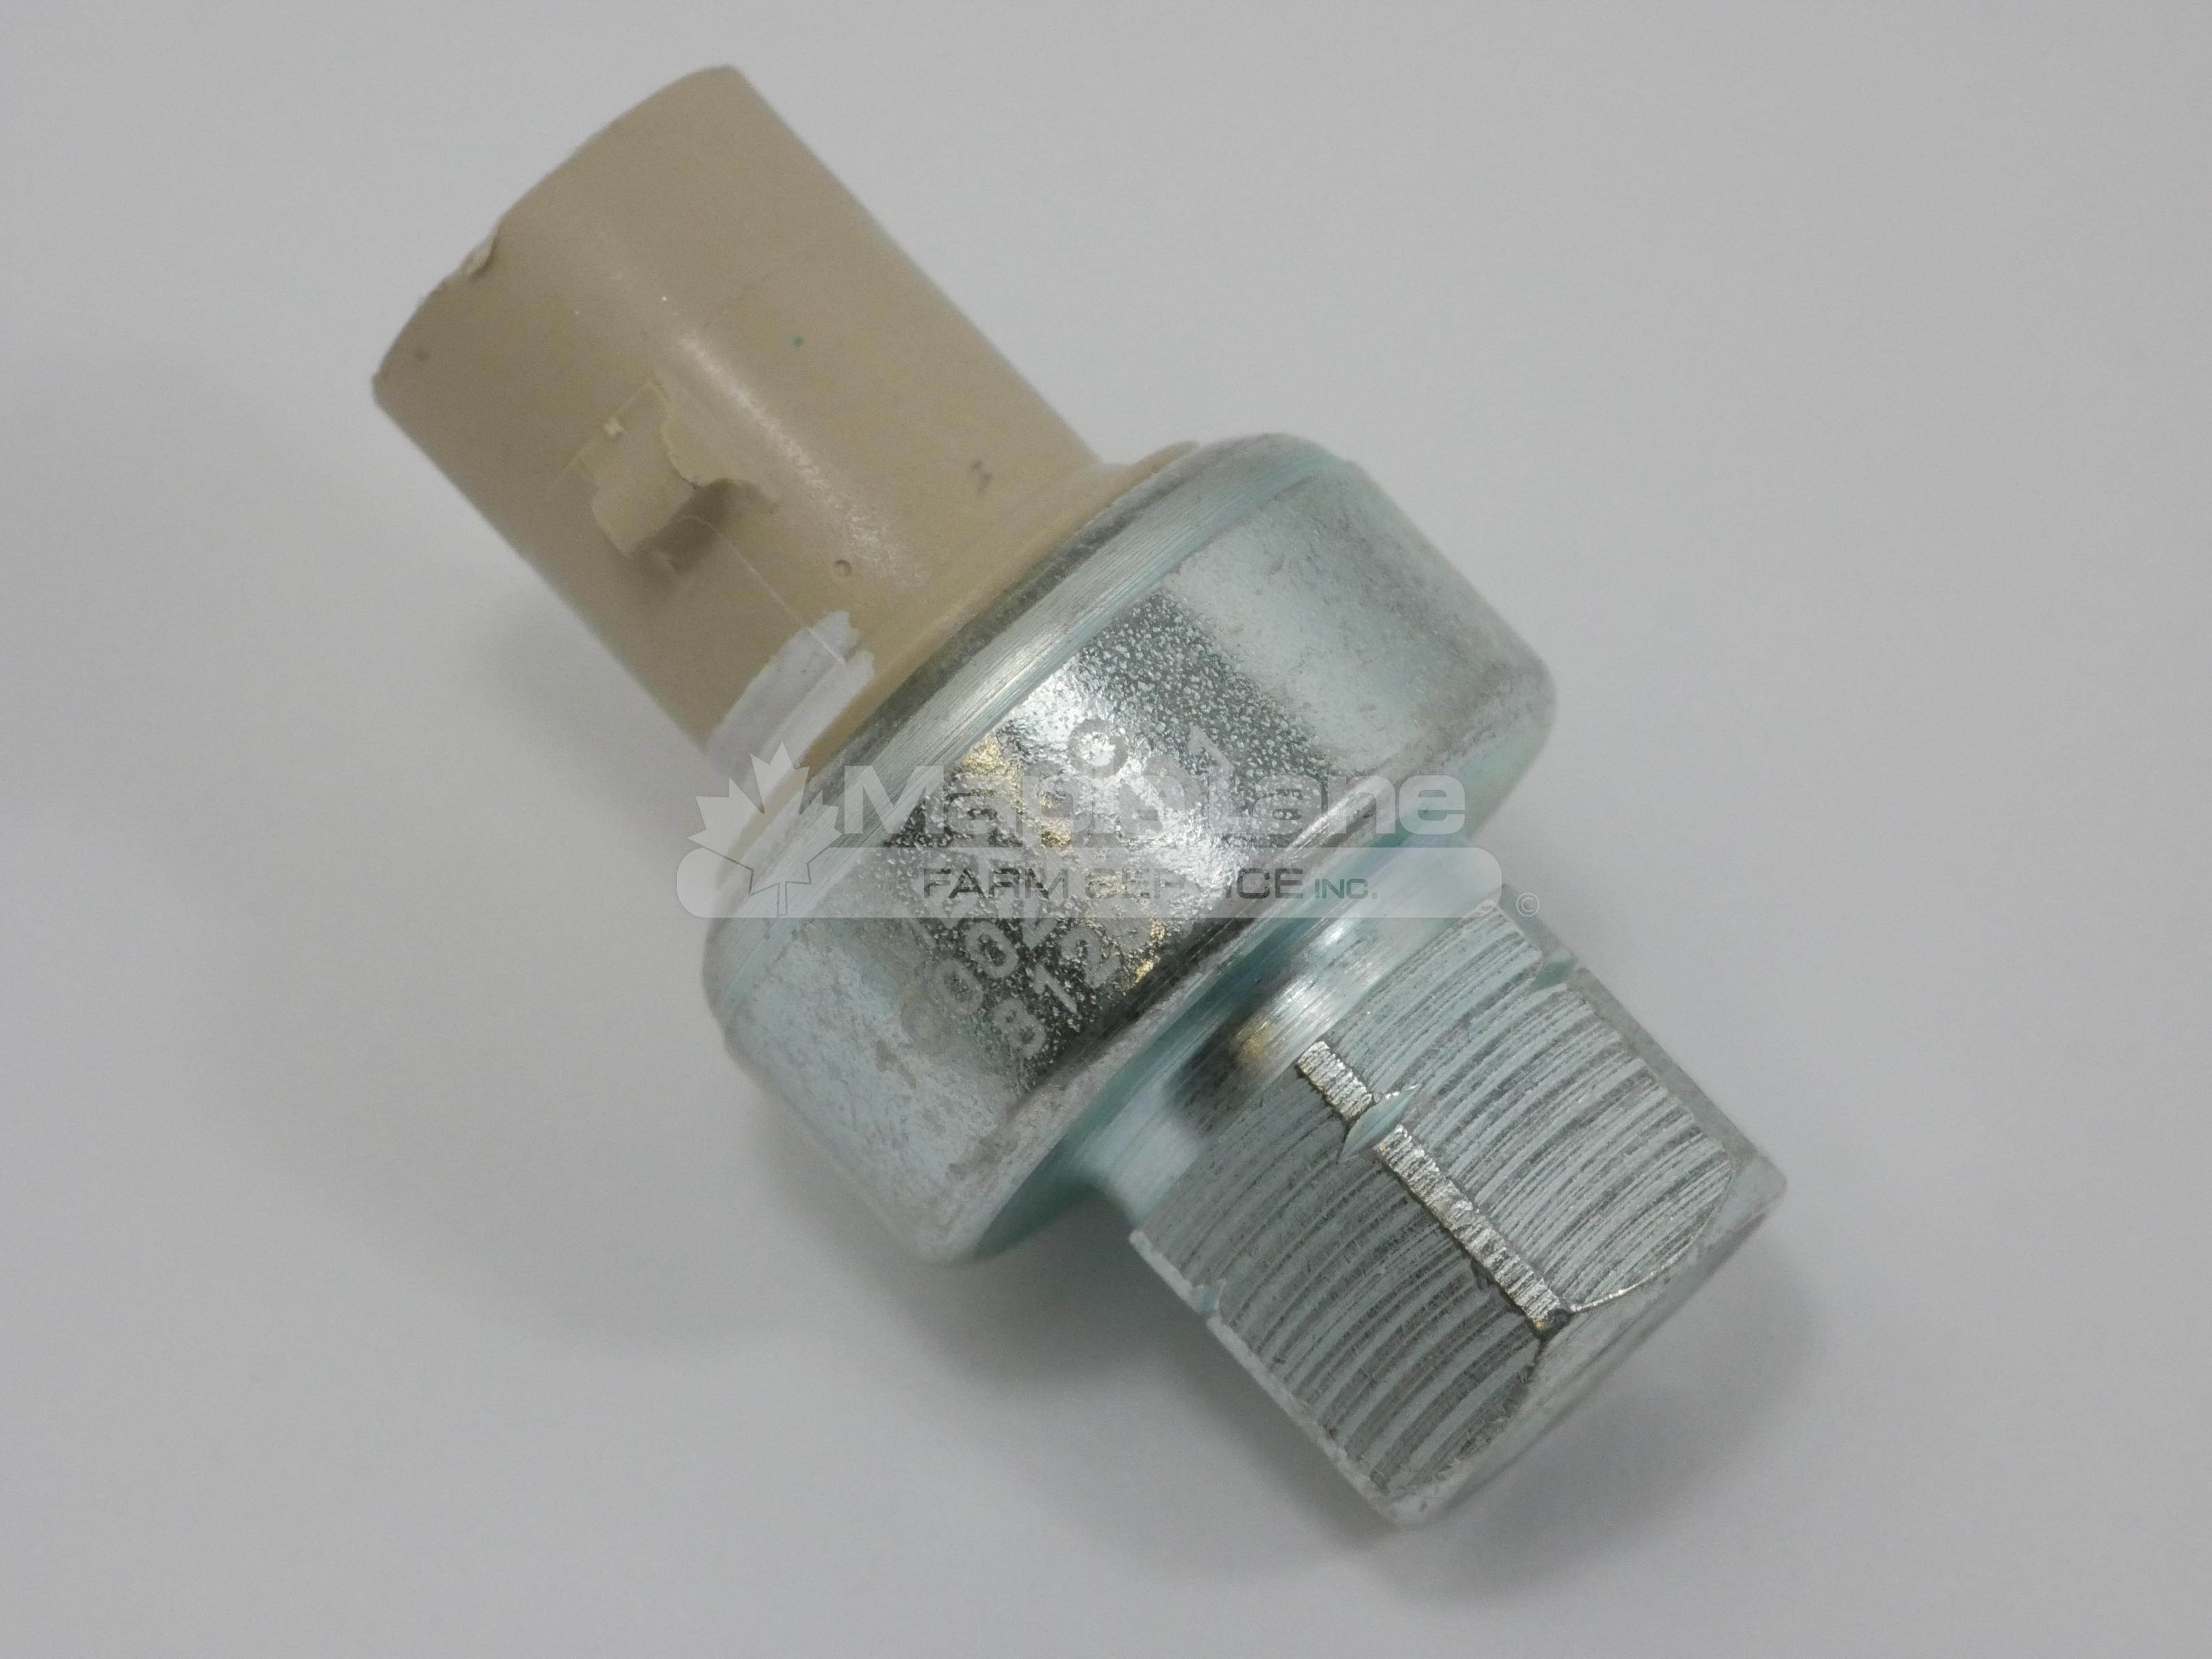 ACW0932940 Pressure Switch